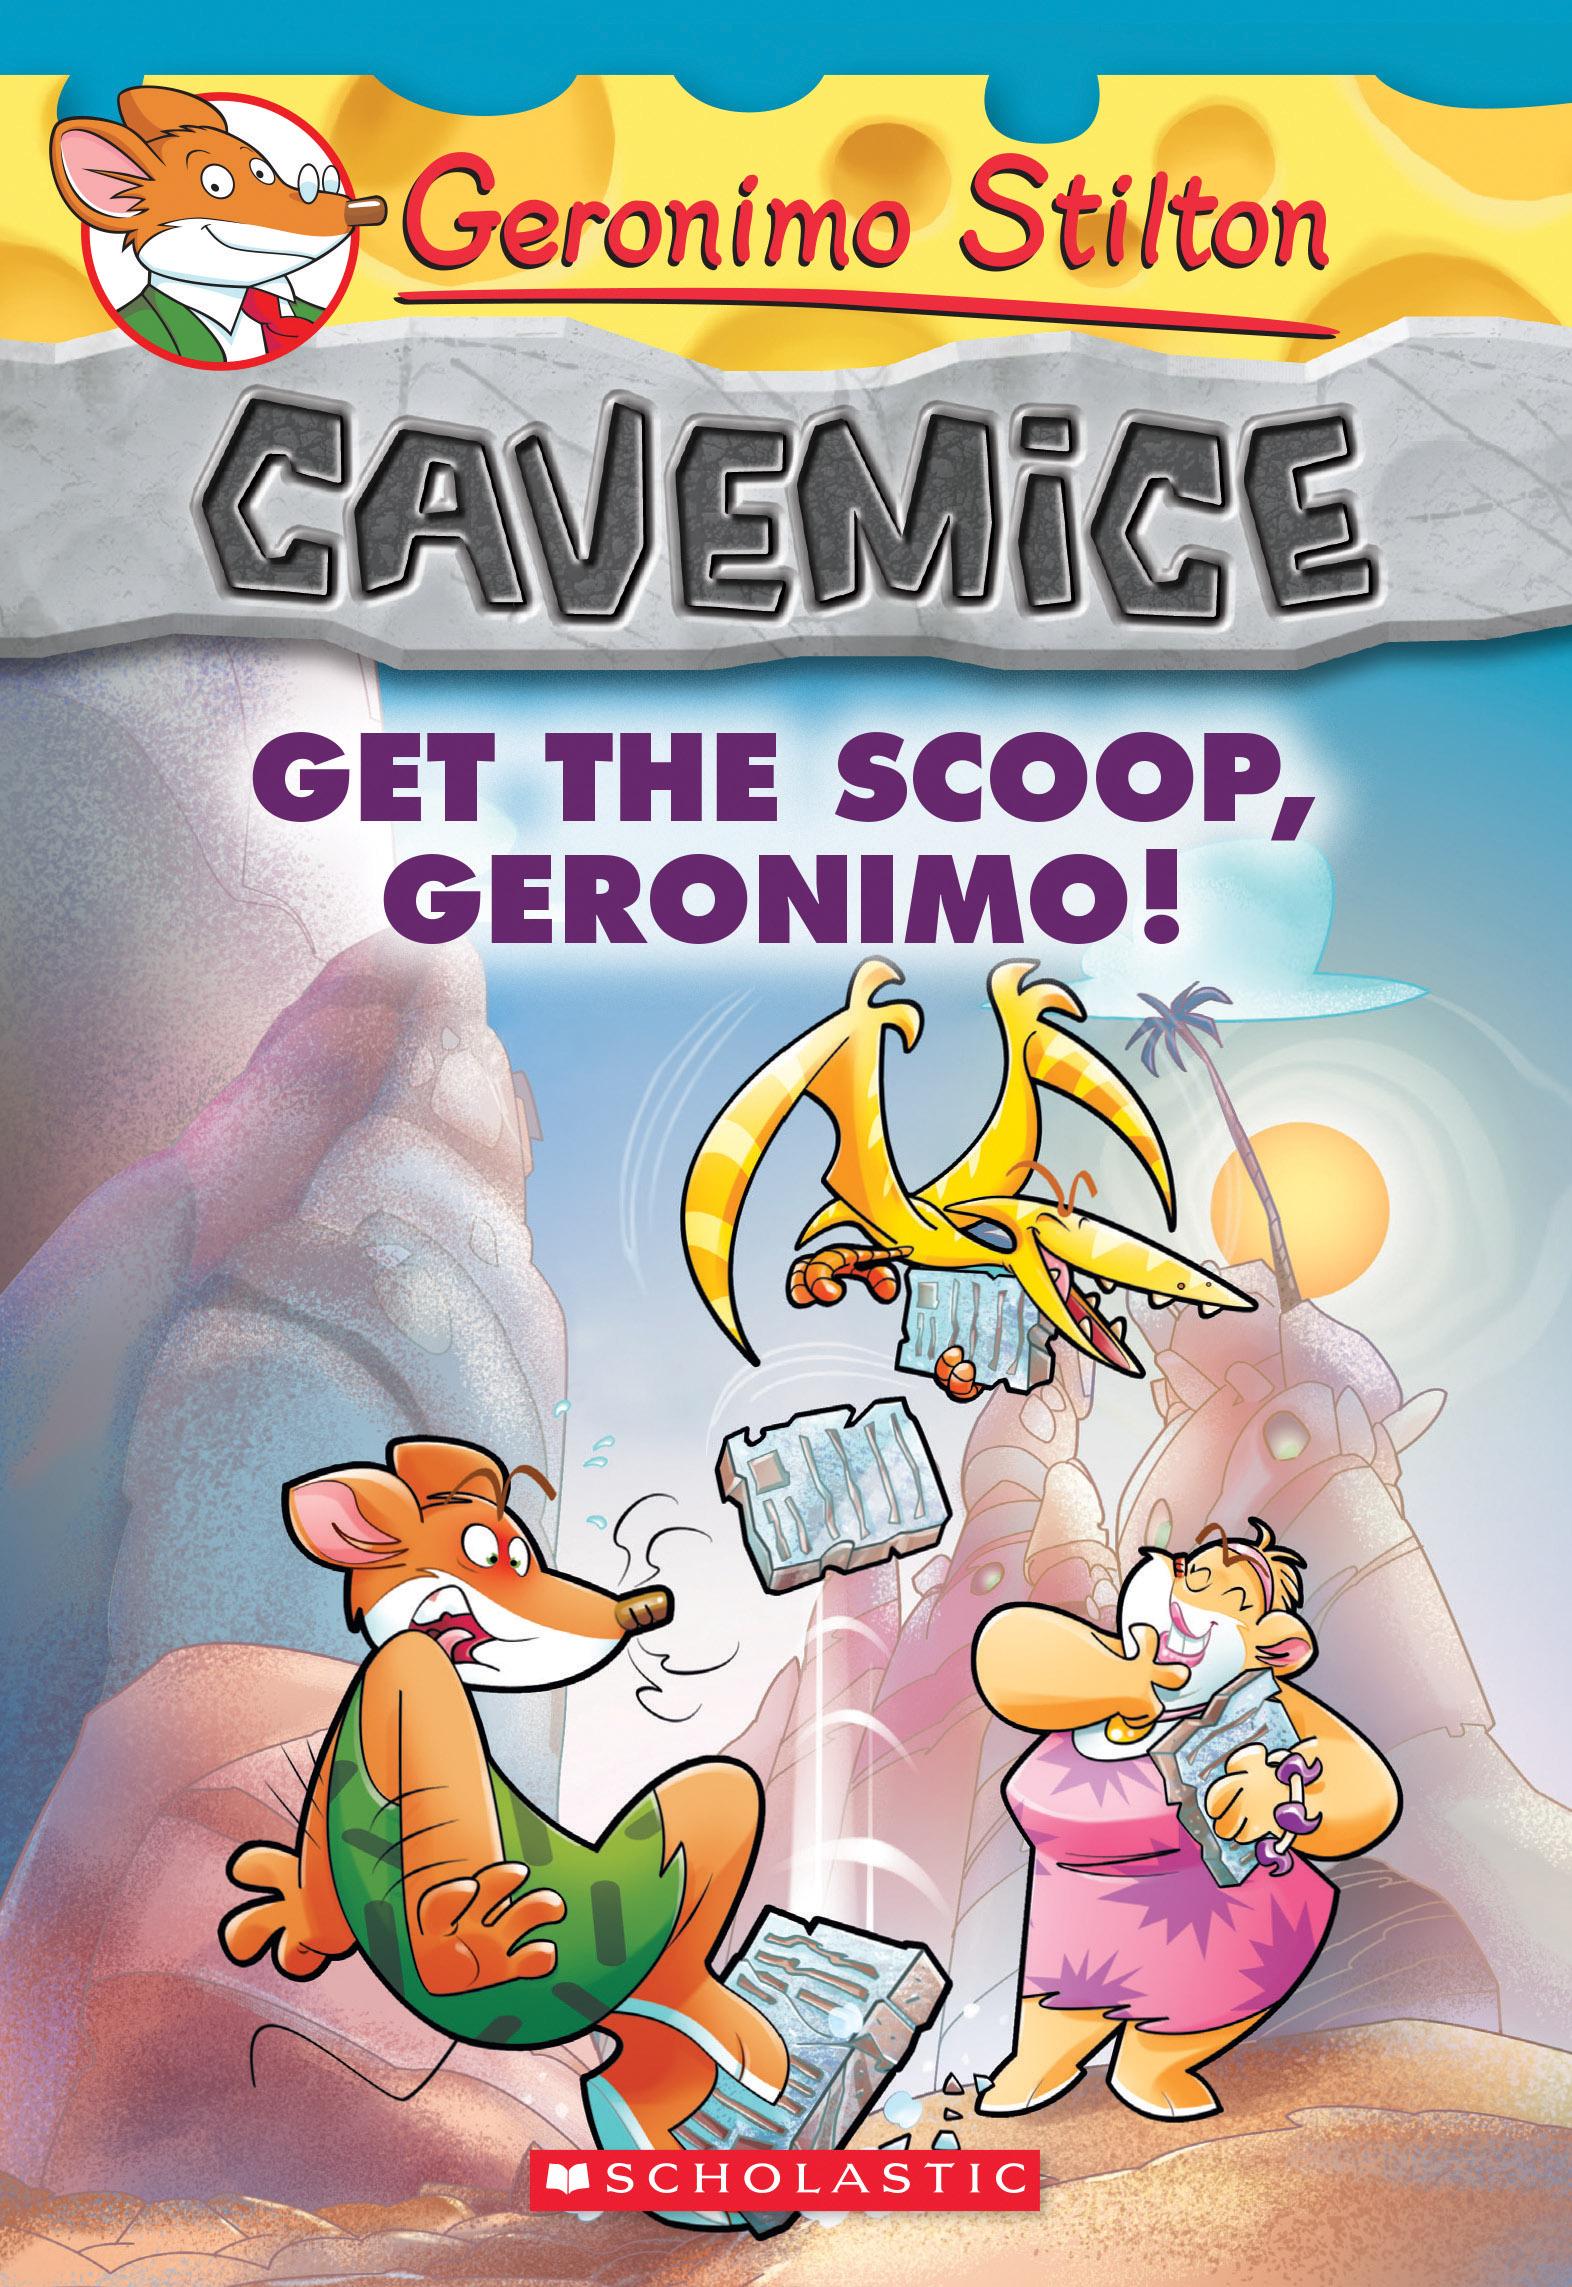 Geronimo Stilton Cavemice #9: Get The Scoop, Geronimo!